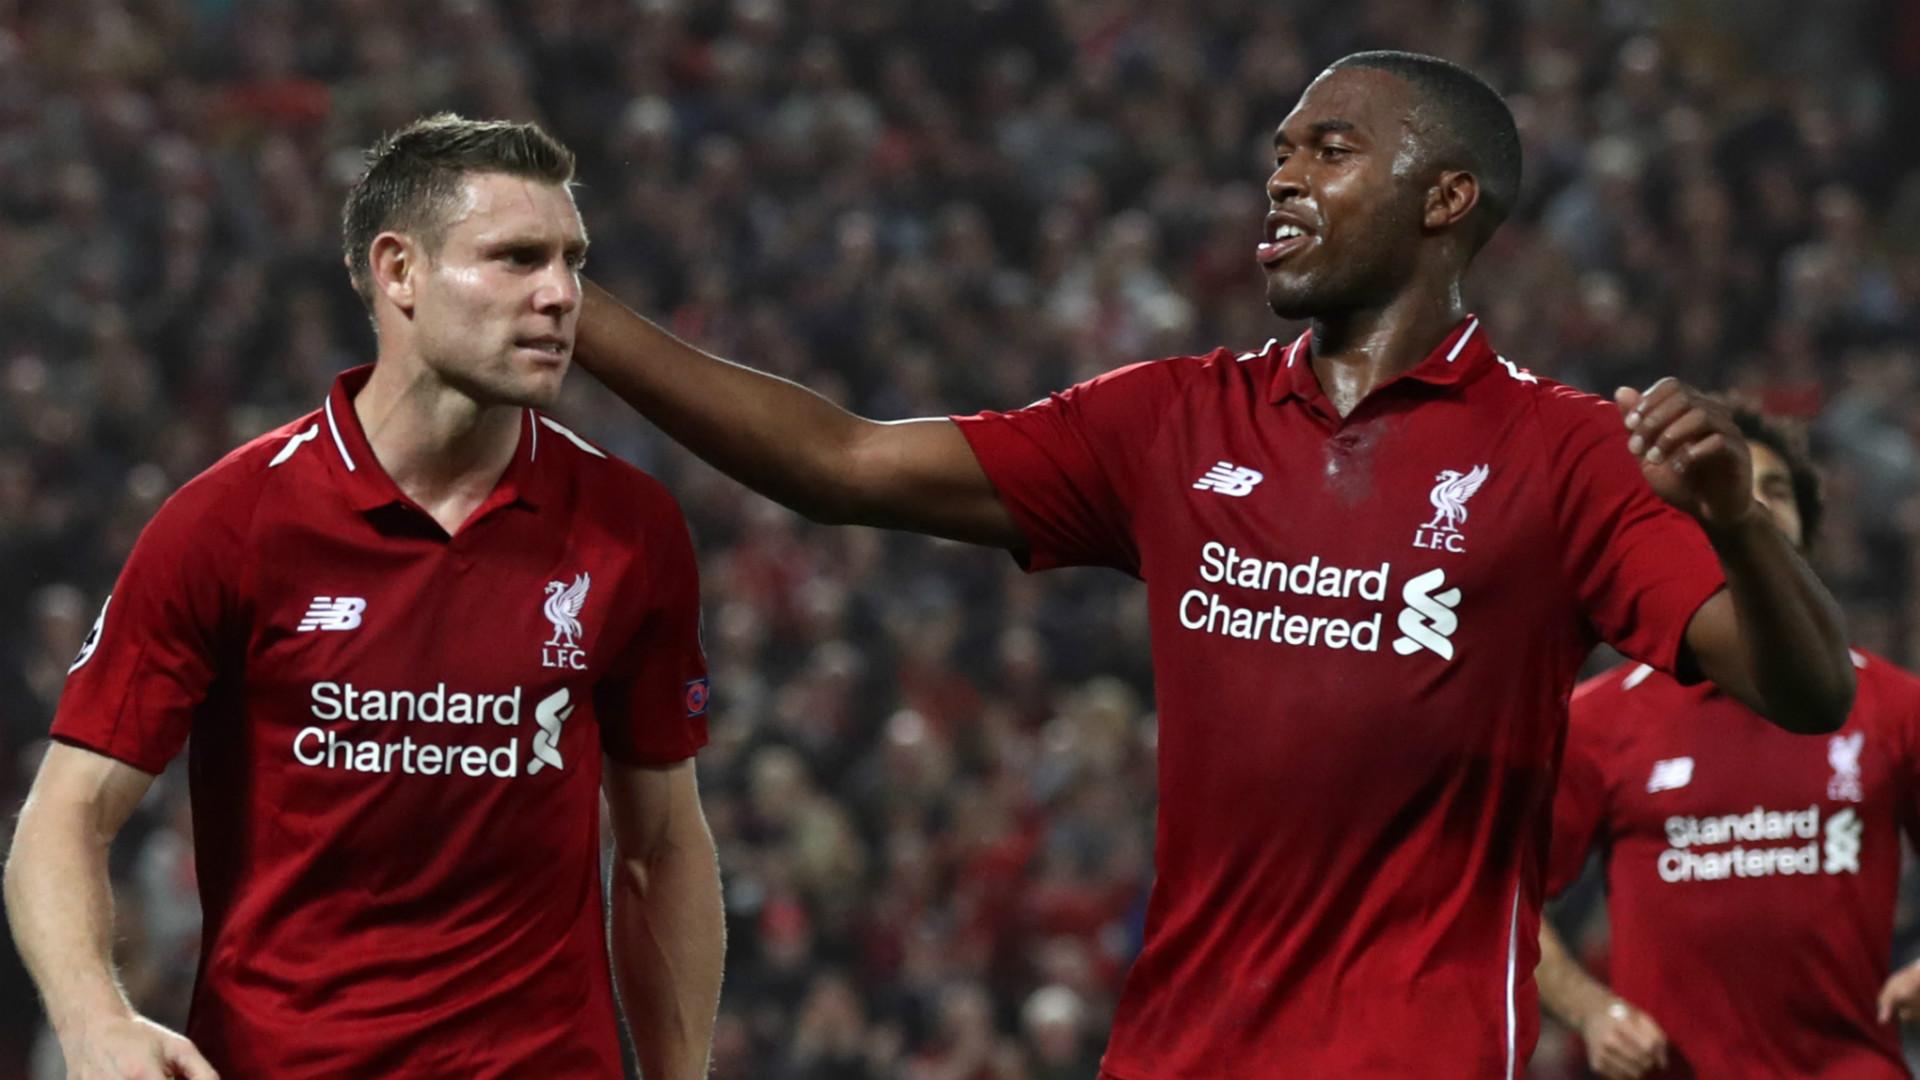 James Milner Daniel Sturridge Liverpool 2018-19